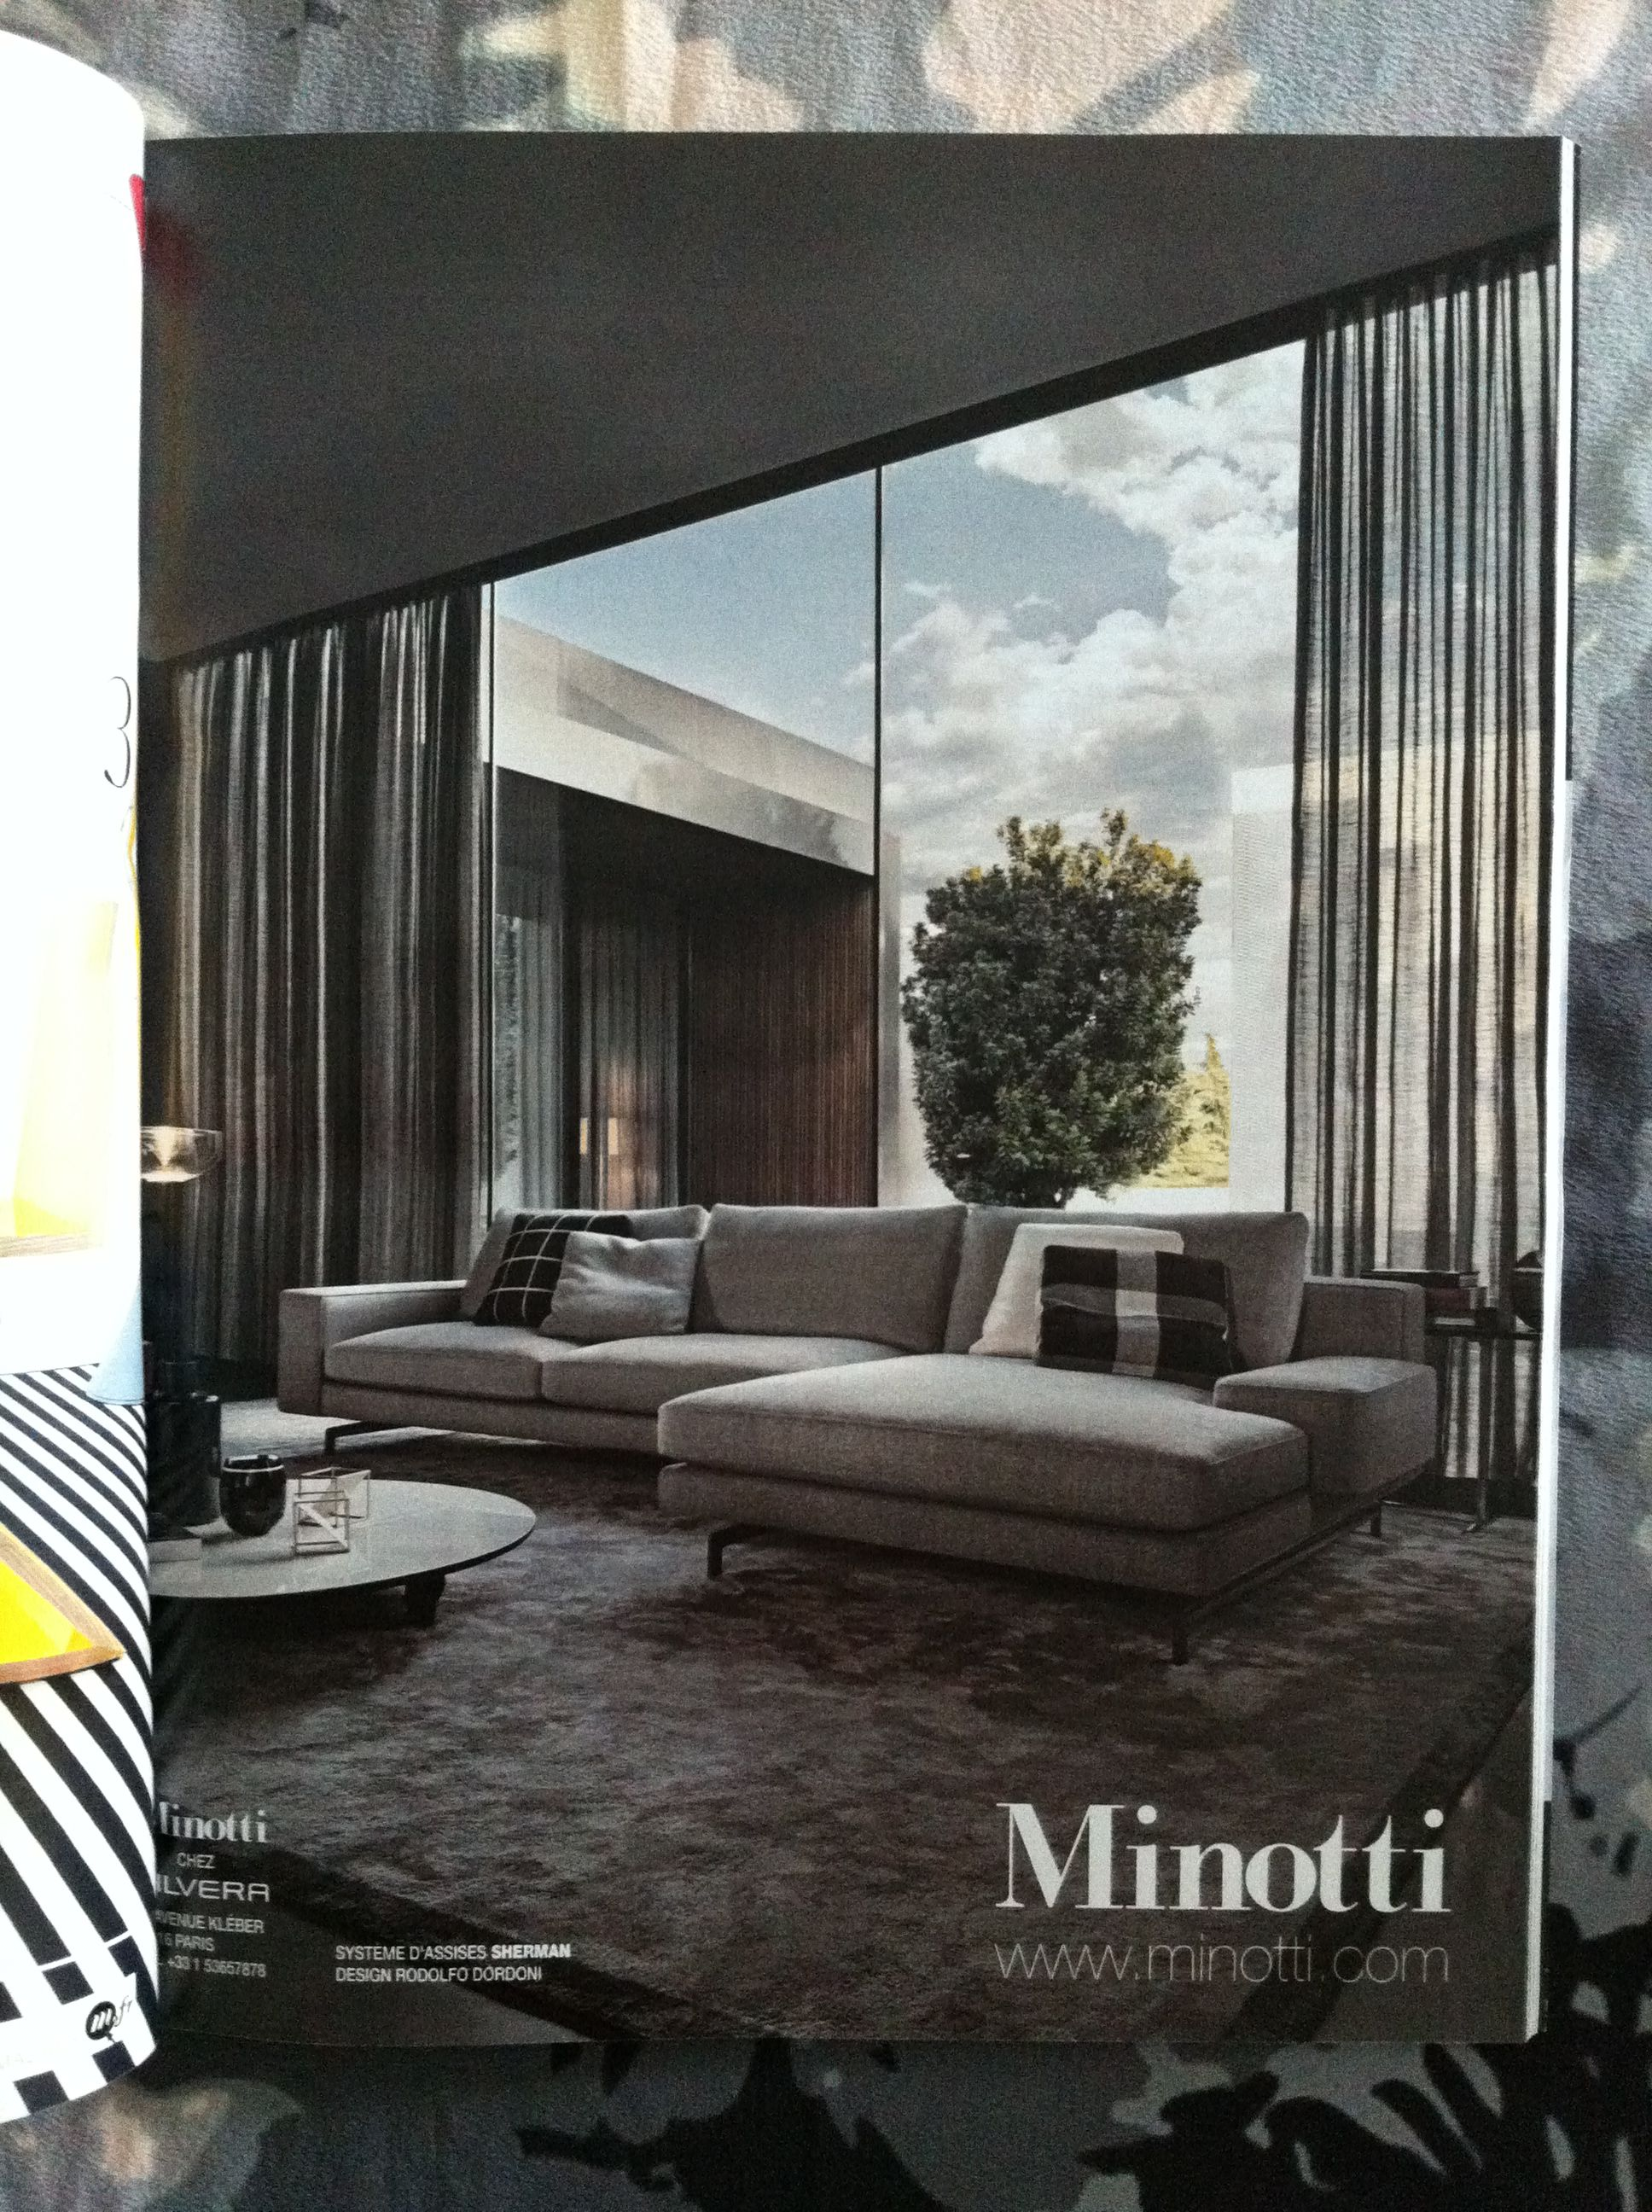 Minotti, style masculin, lounge, chic | Design di interni ...